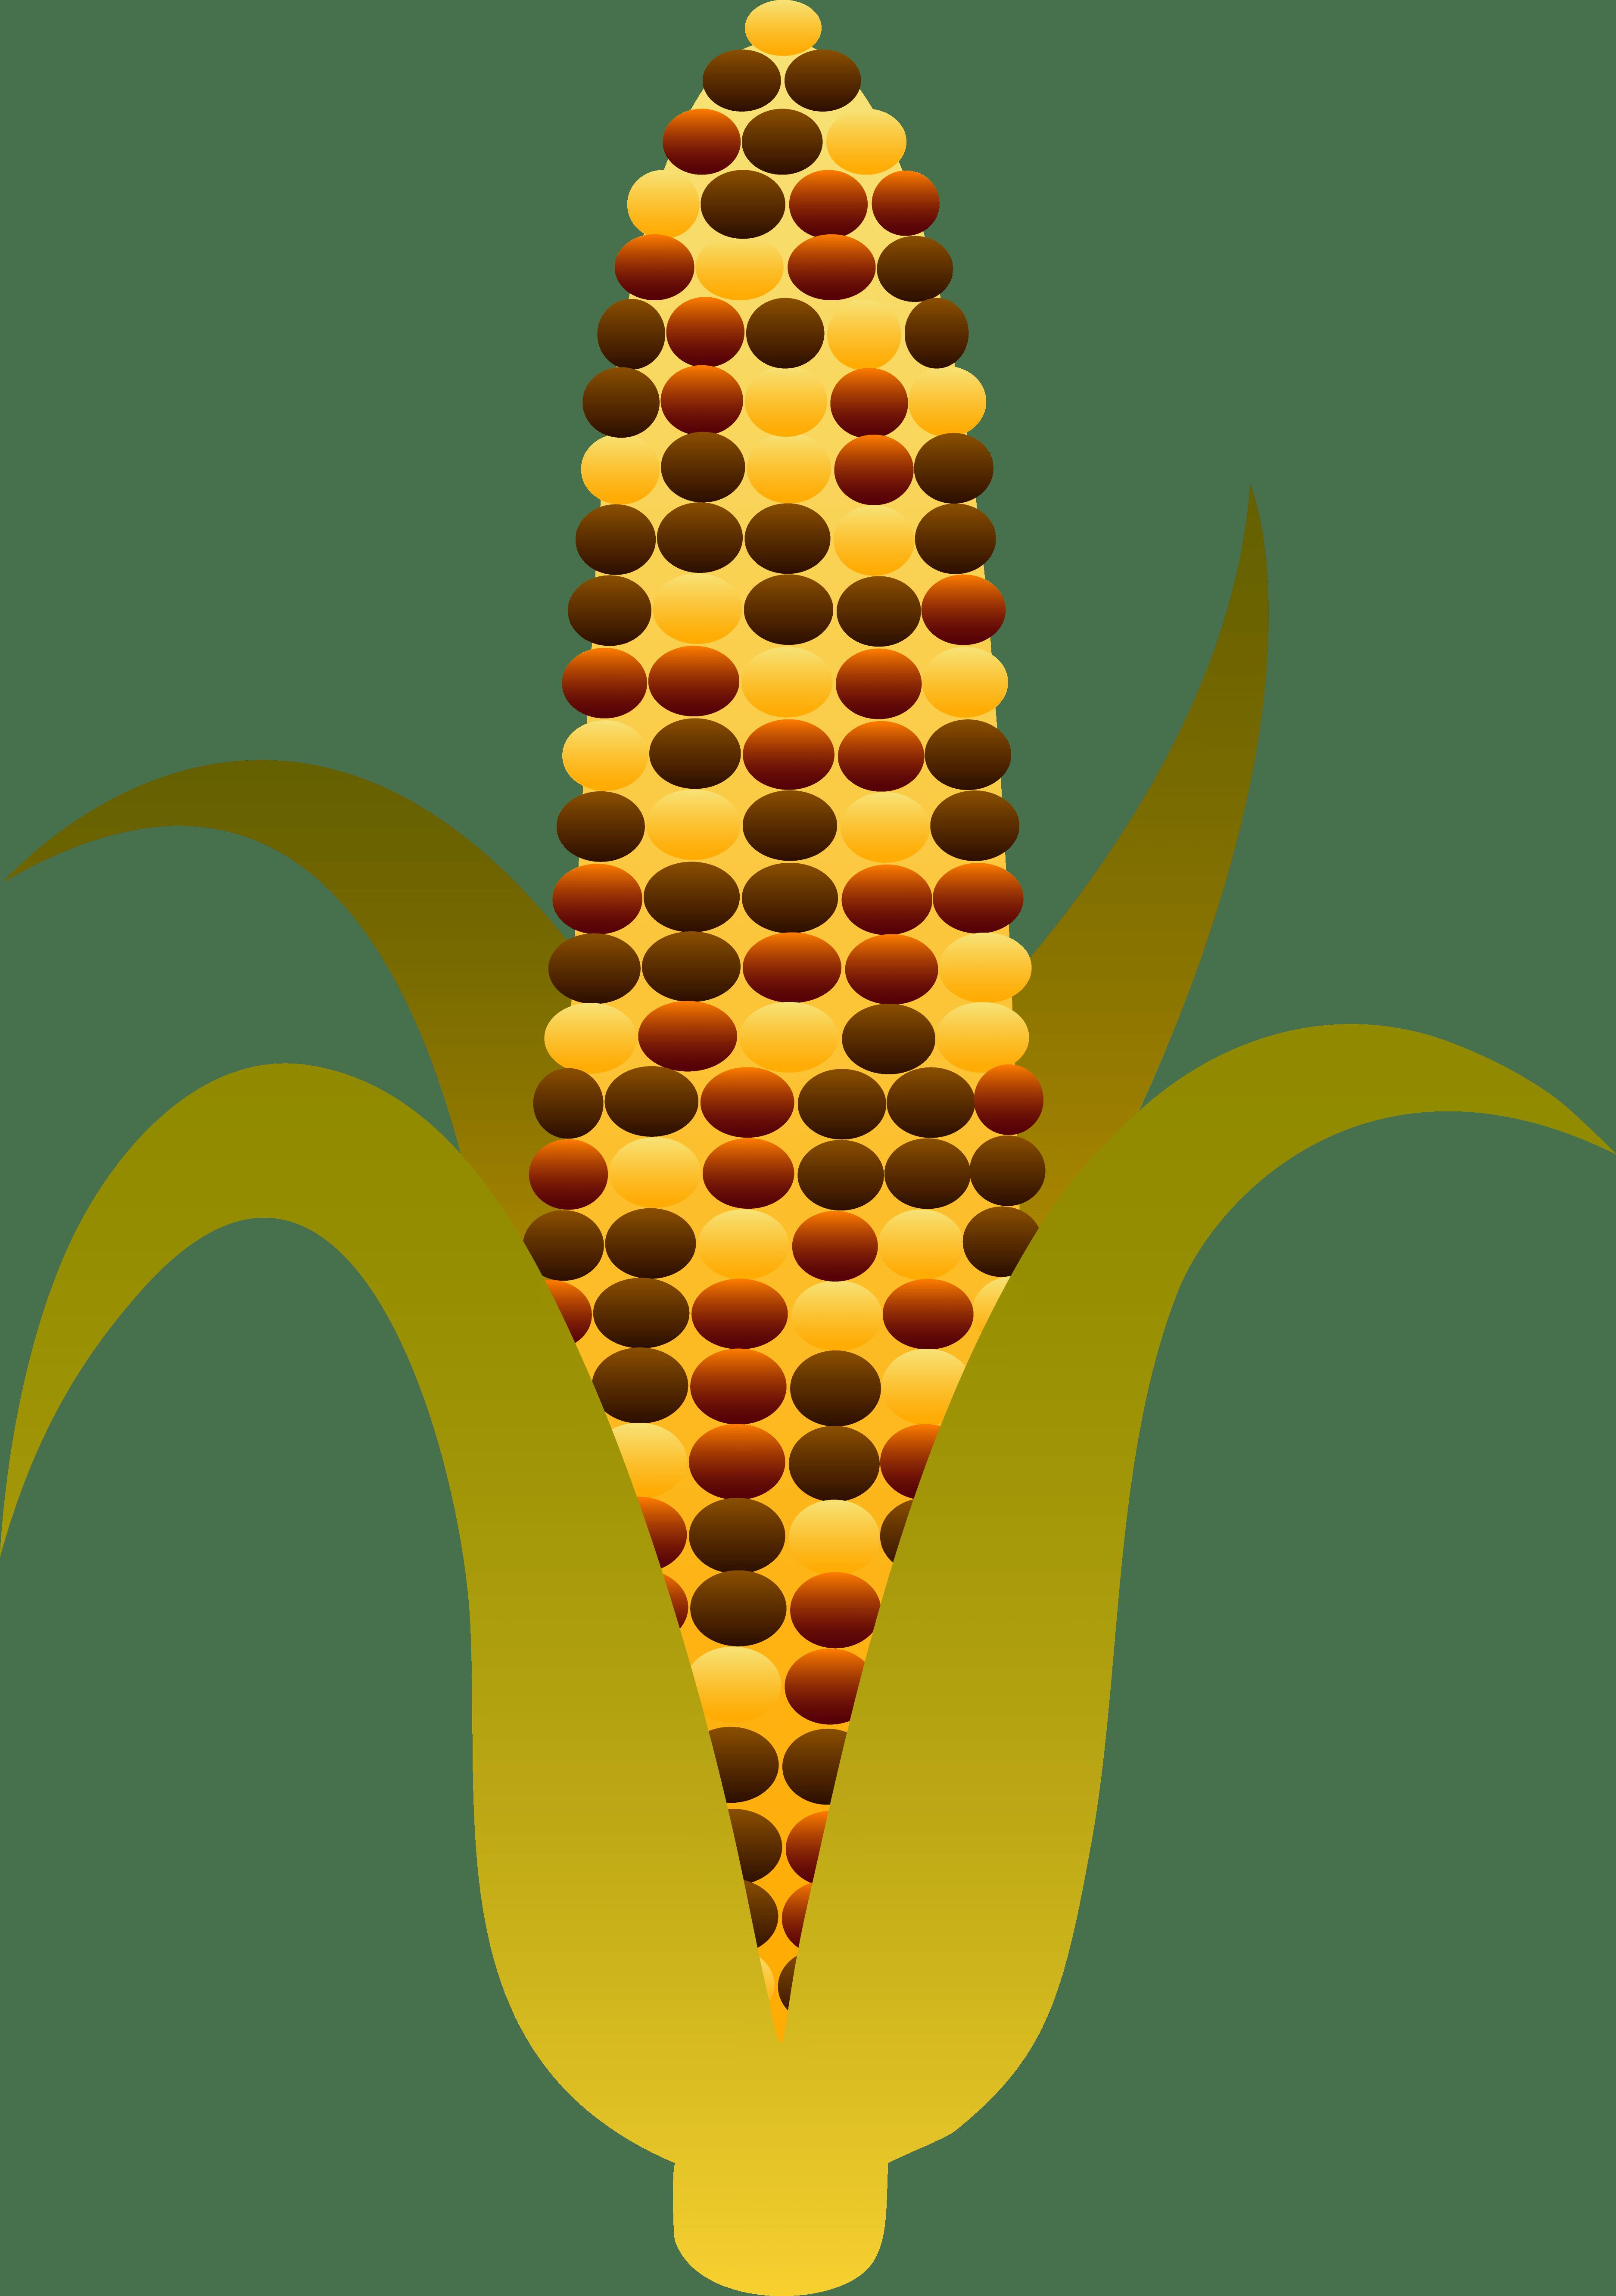 Corn clipart printable, Corn printable Transparent FREE for.